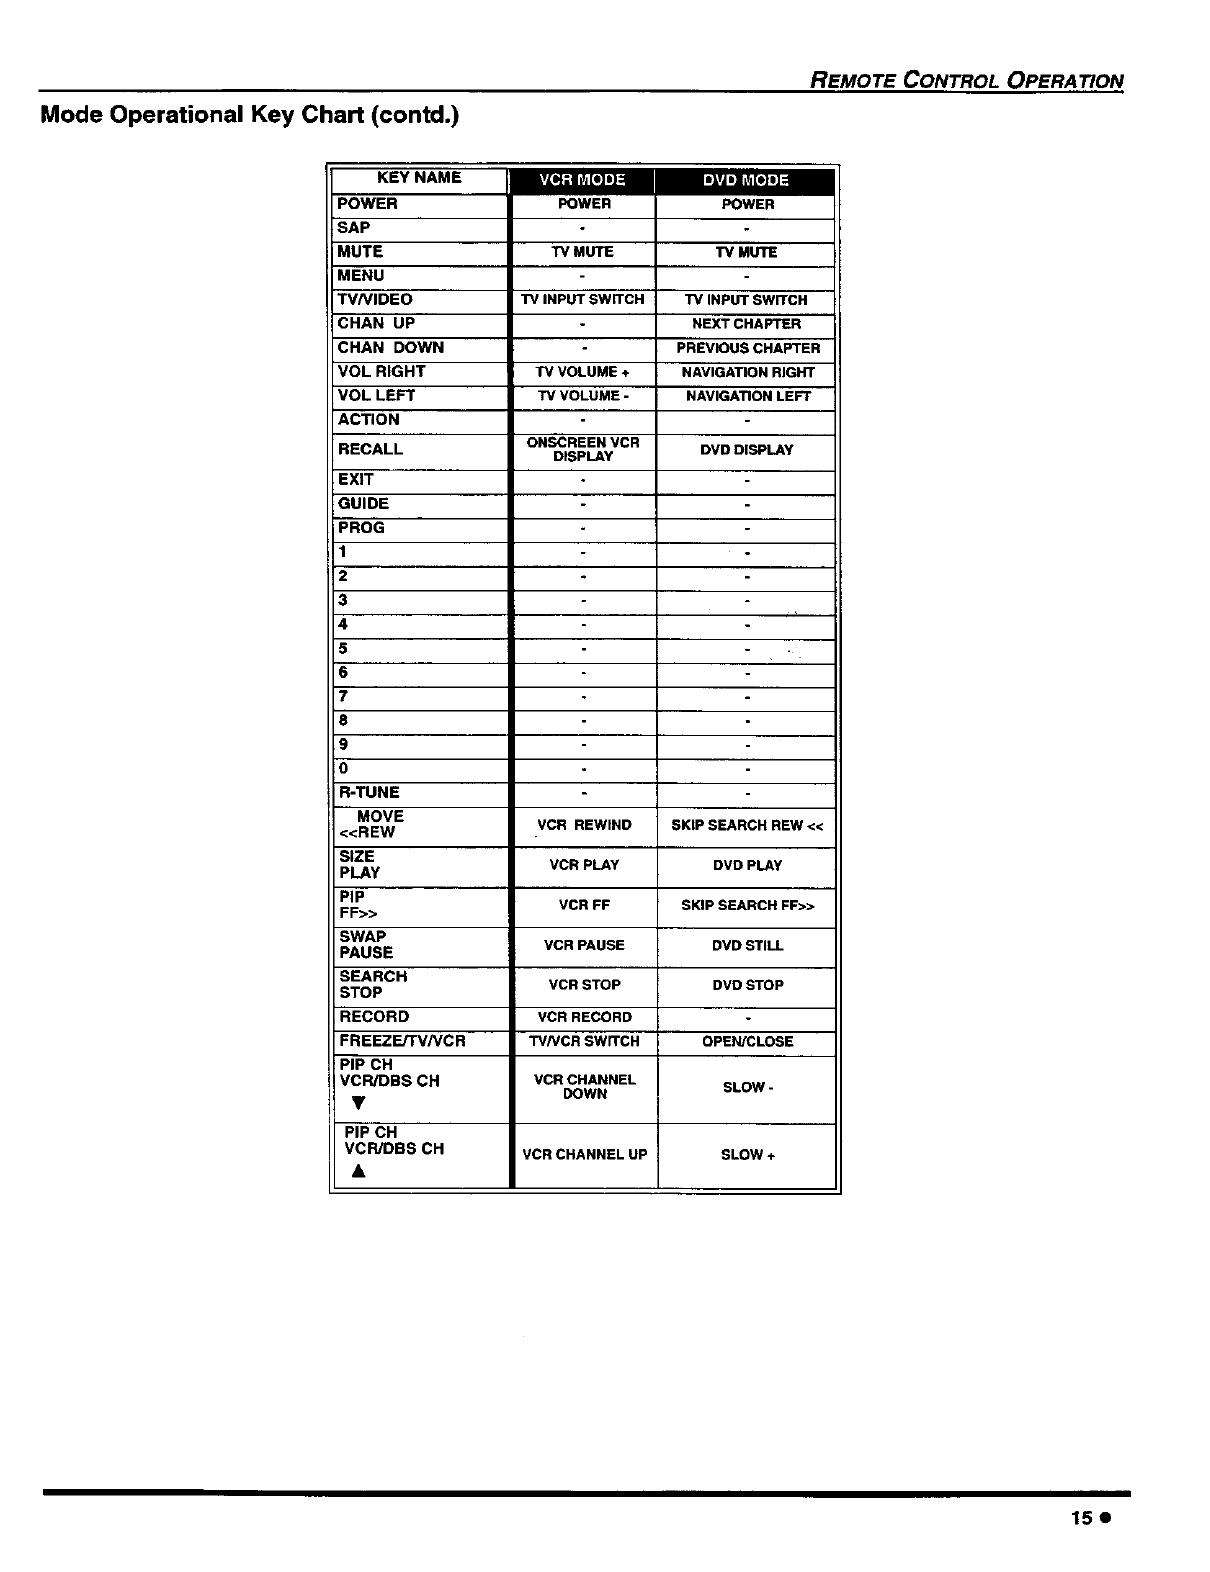 mode operational key chart (contd )